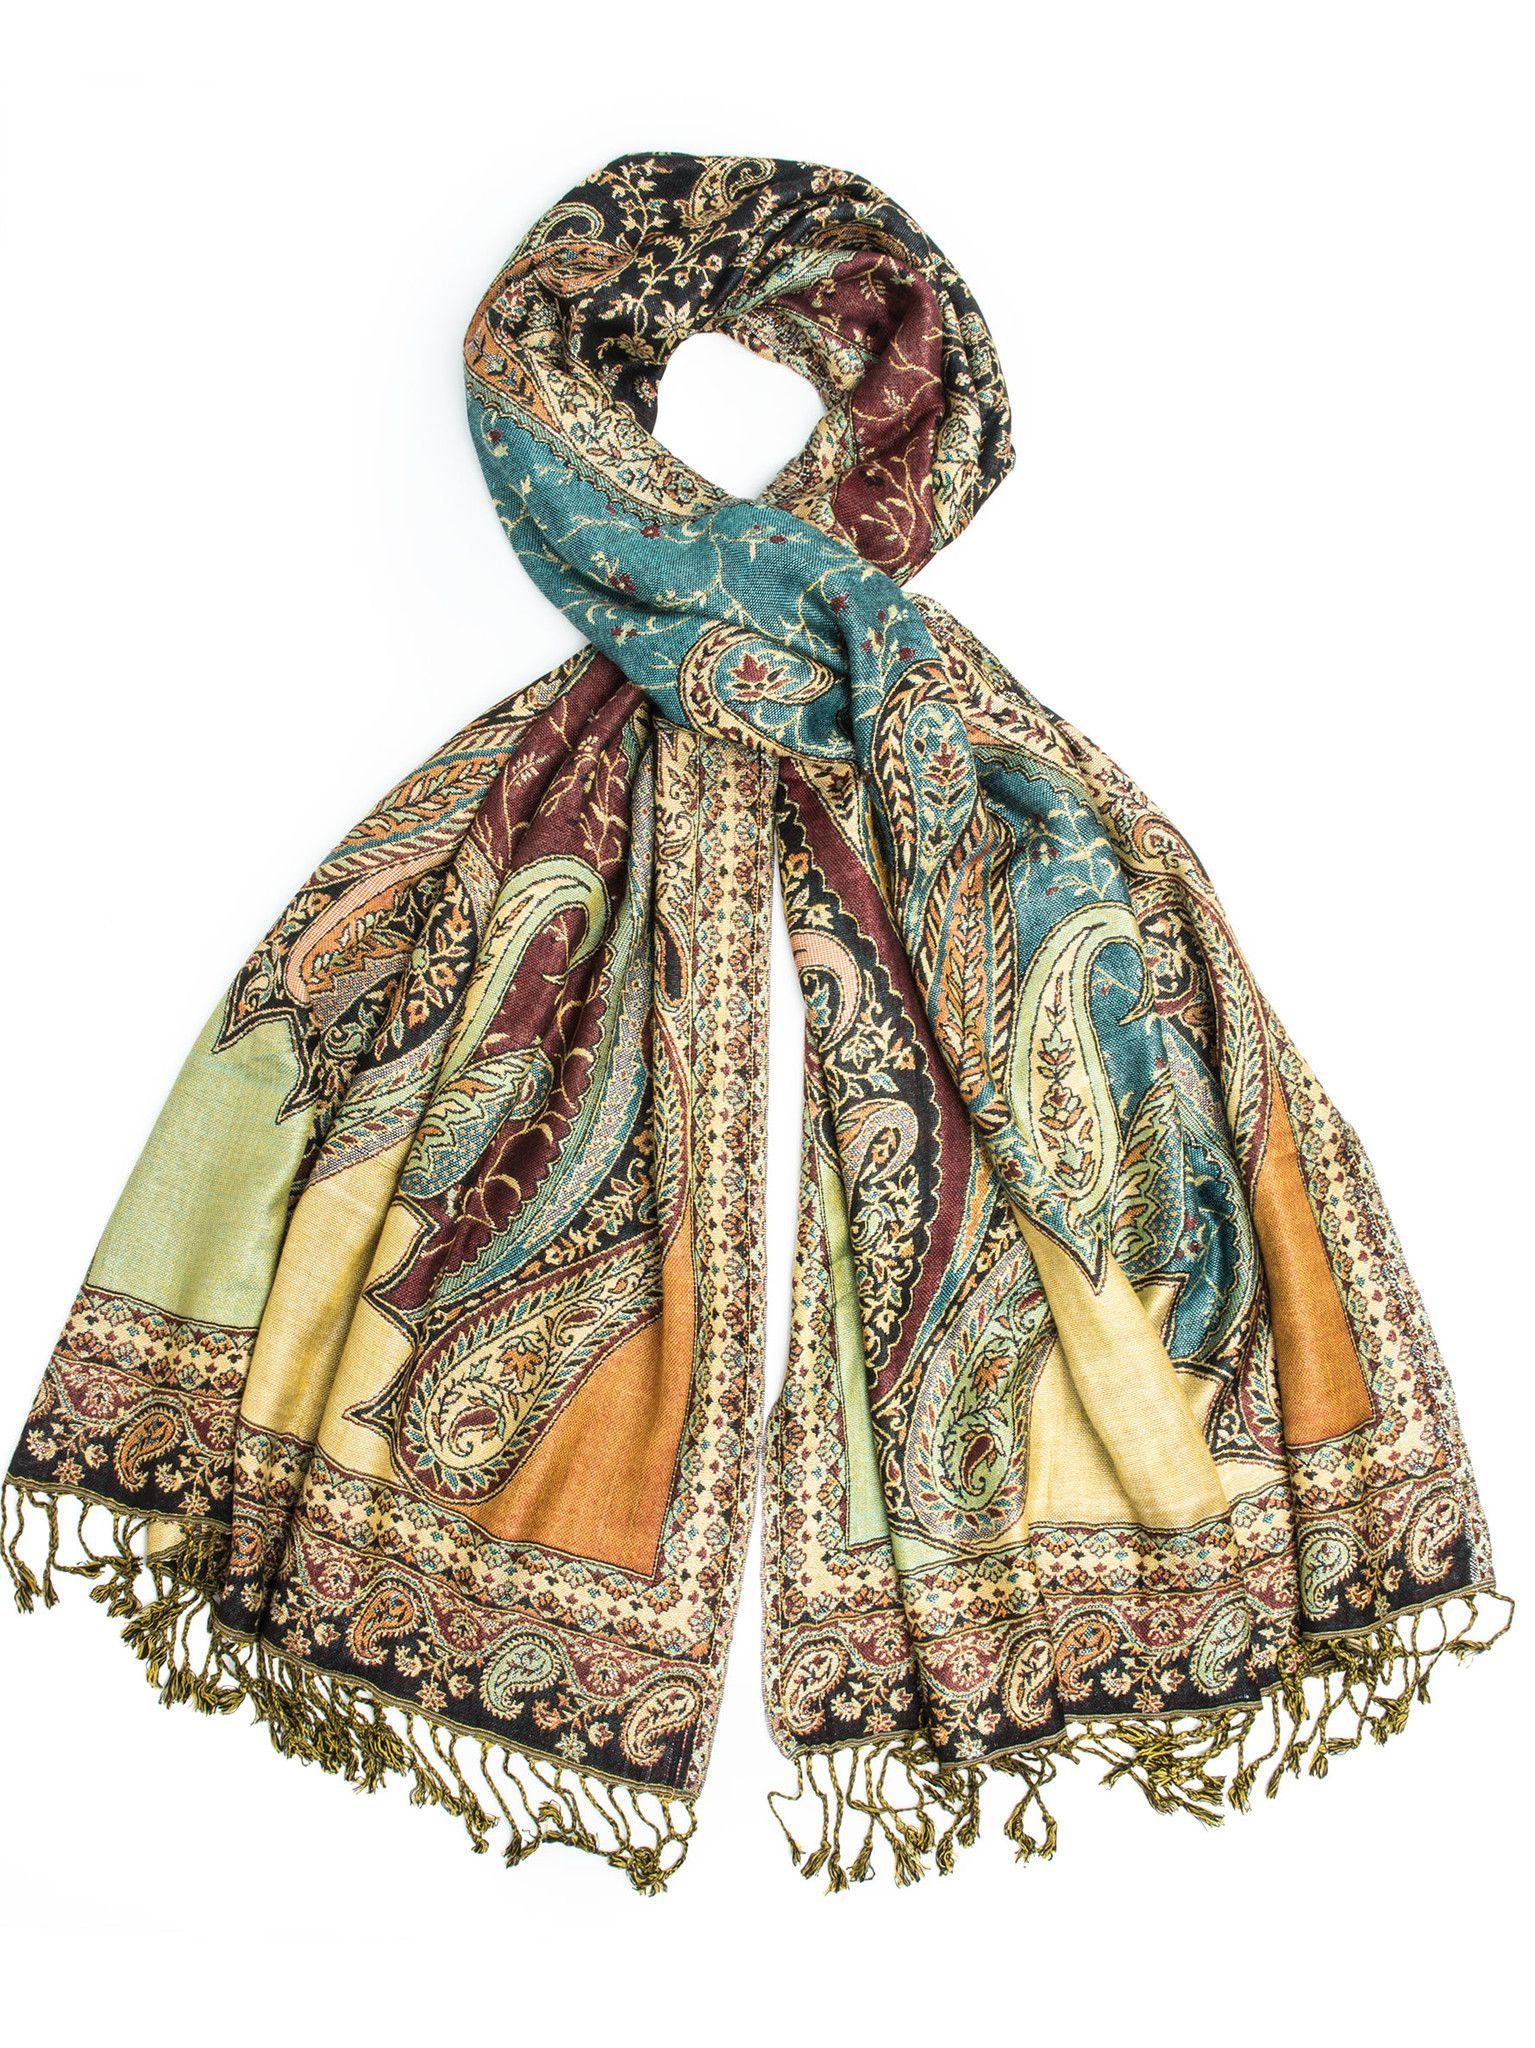 Cashmere Pashmina /& Silk Shawl Scarf Wrap Handmade in Nepal